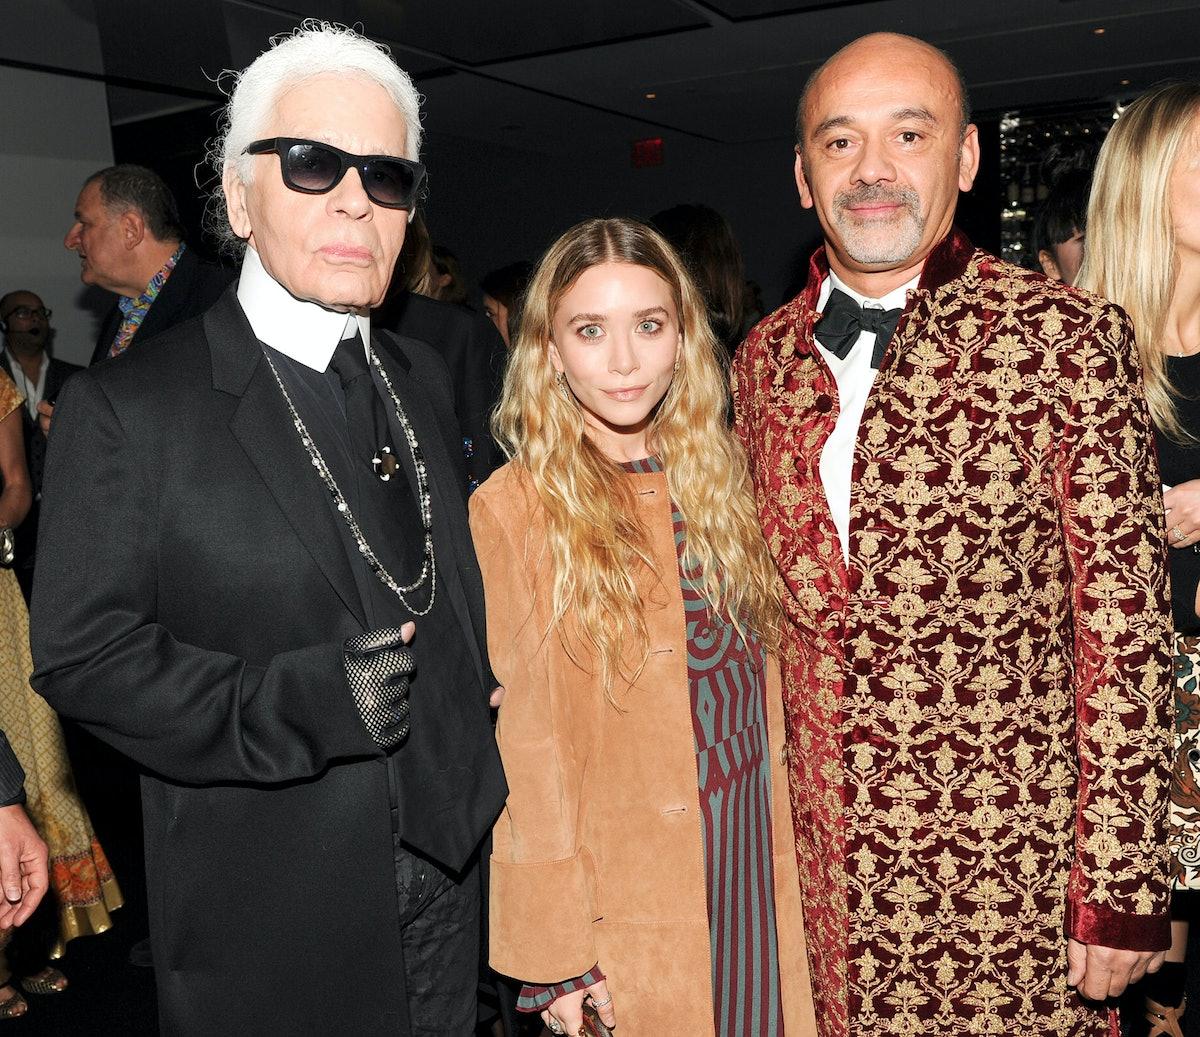 Karl Lagerfeld, Ashley Olsen, and Christian Louboutin